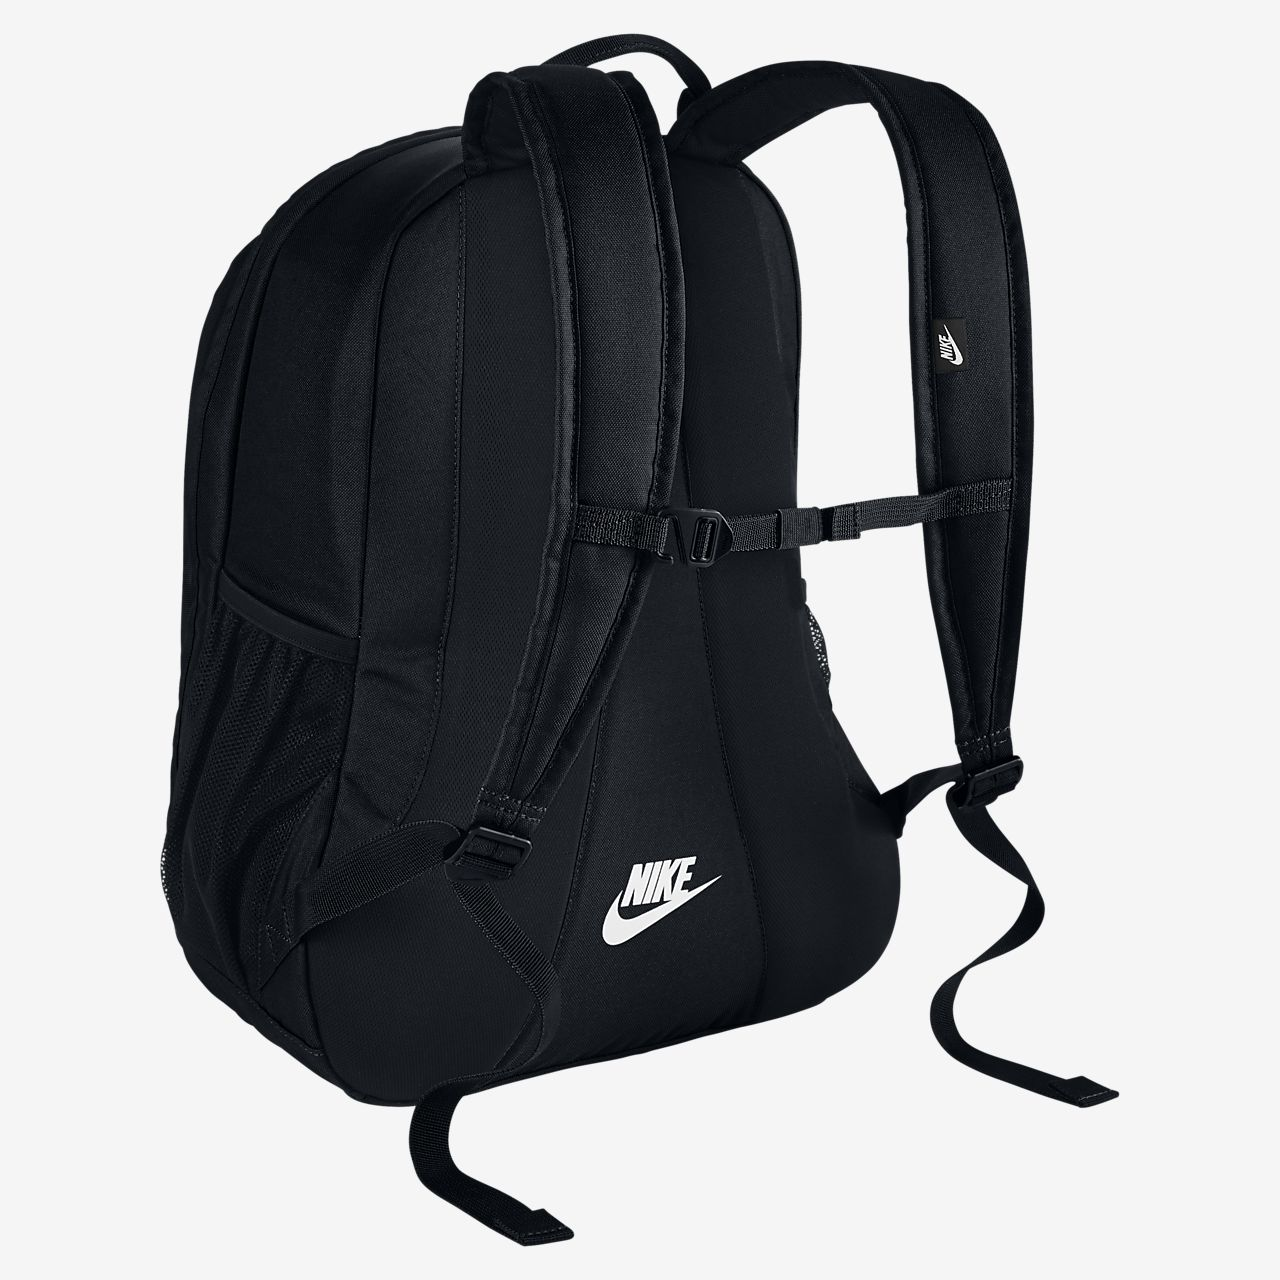 0 Hayward Futura À 2 Sac Nike Sportswear Dos 0XwPkN8nO